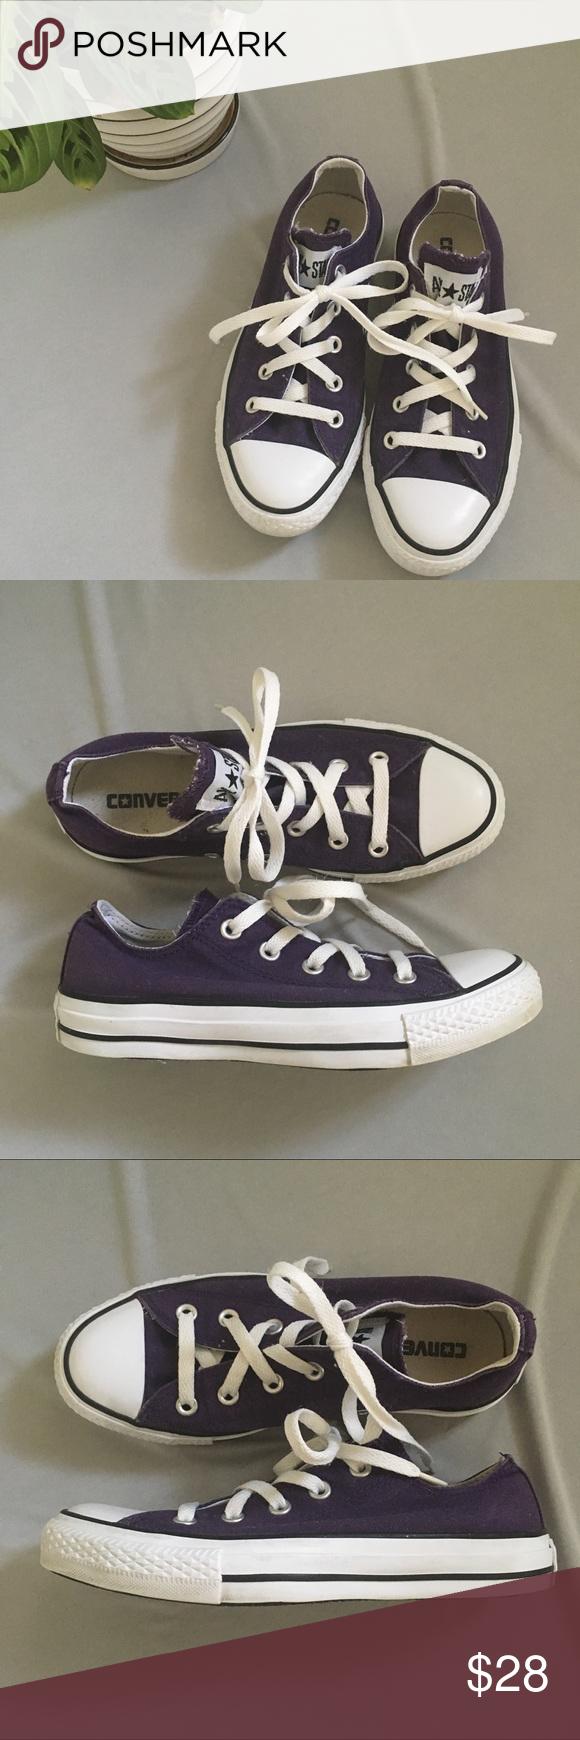 Converse Chuck Taylor All Stars Low Top Purple Color: Dark